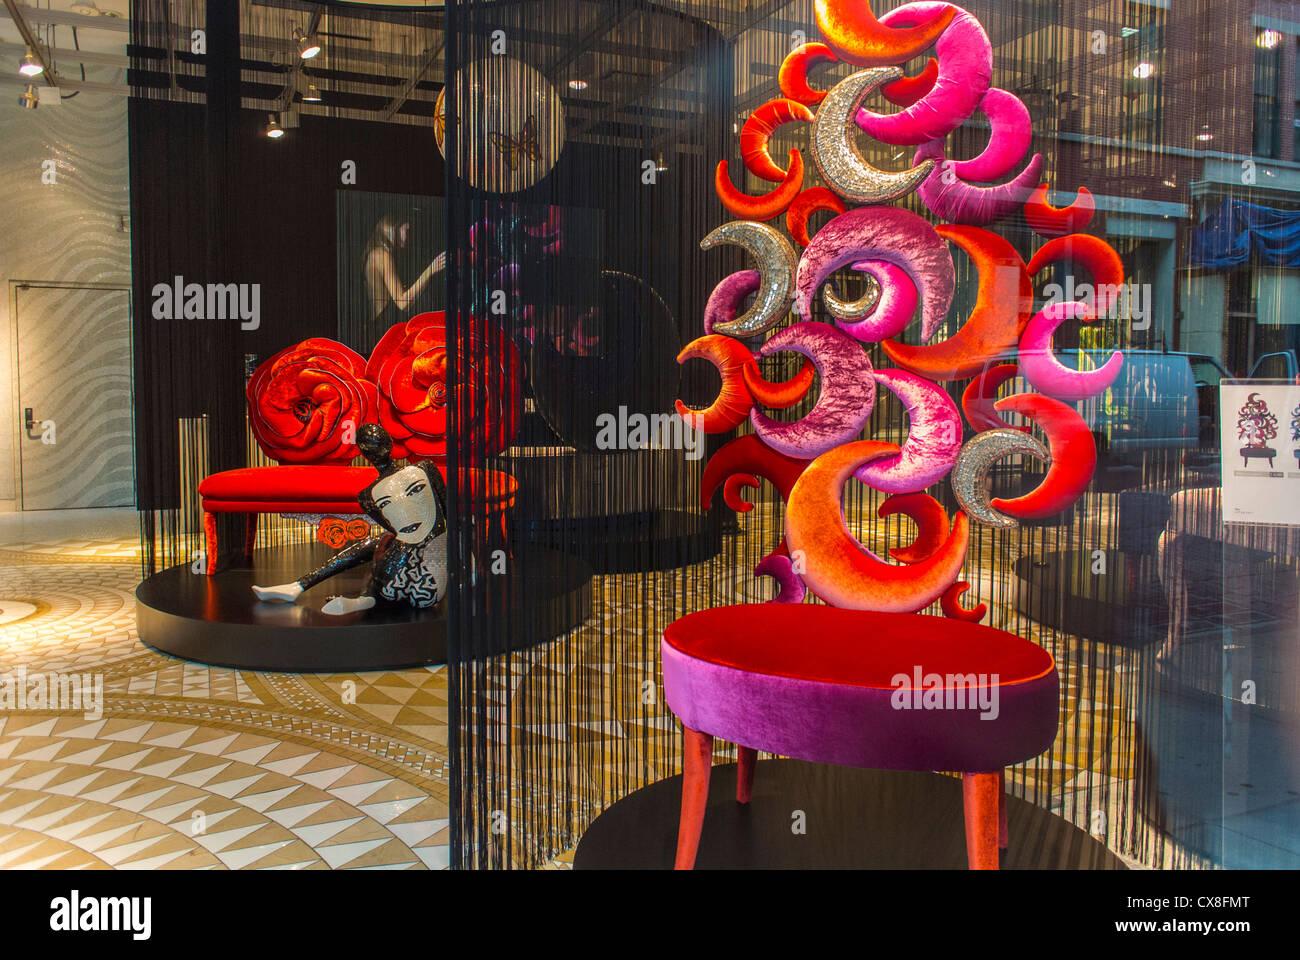 New york ny usa soho shopping contemporary furniture for Furniture stores in soho new york city